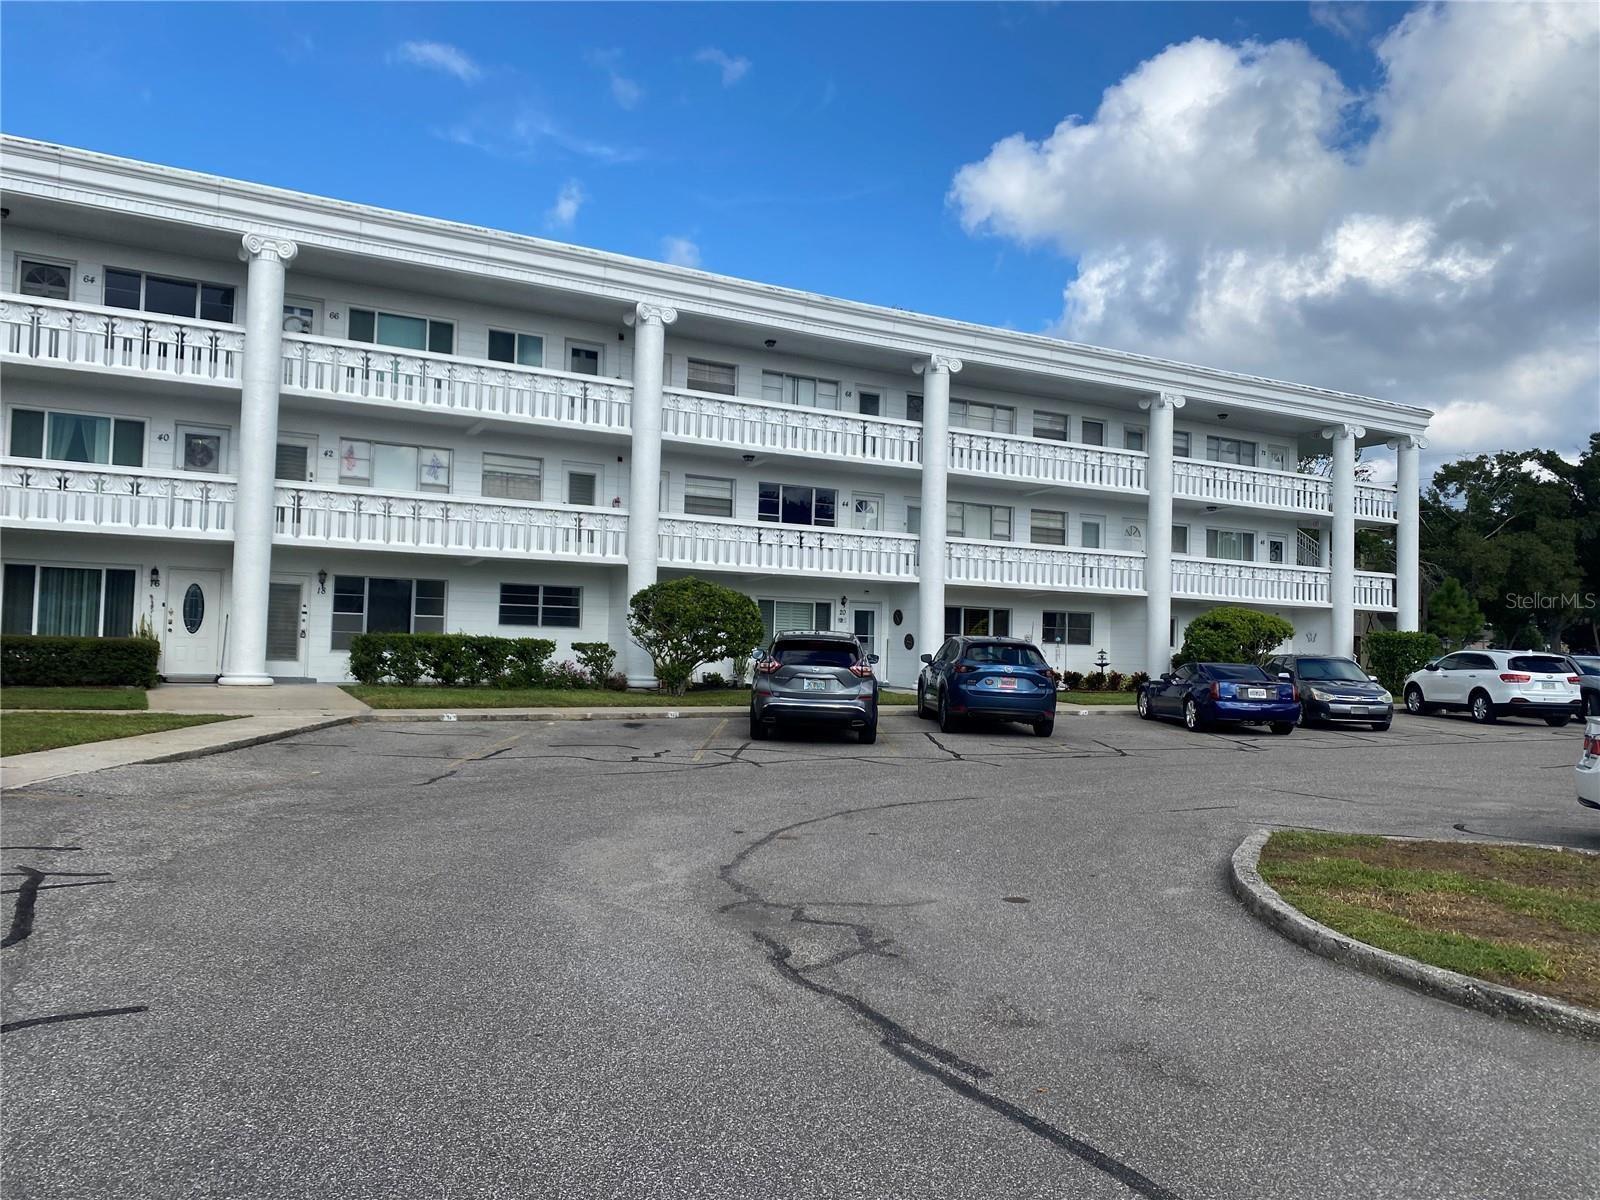 2454 AUSTRALIA WAY E #18, Clearwater, FL 33763 - #: U8135392